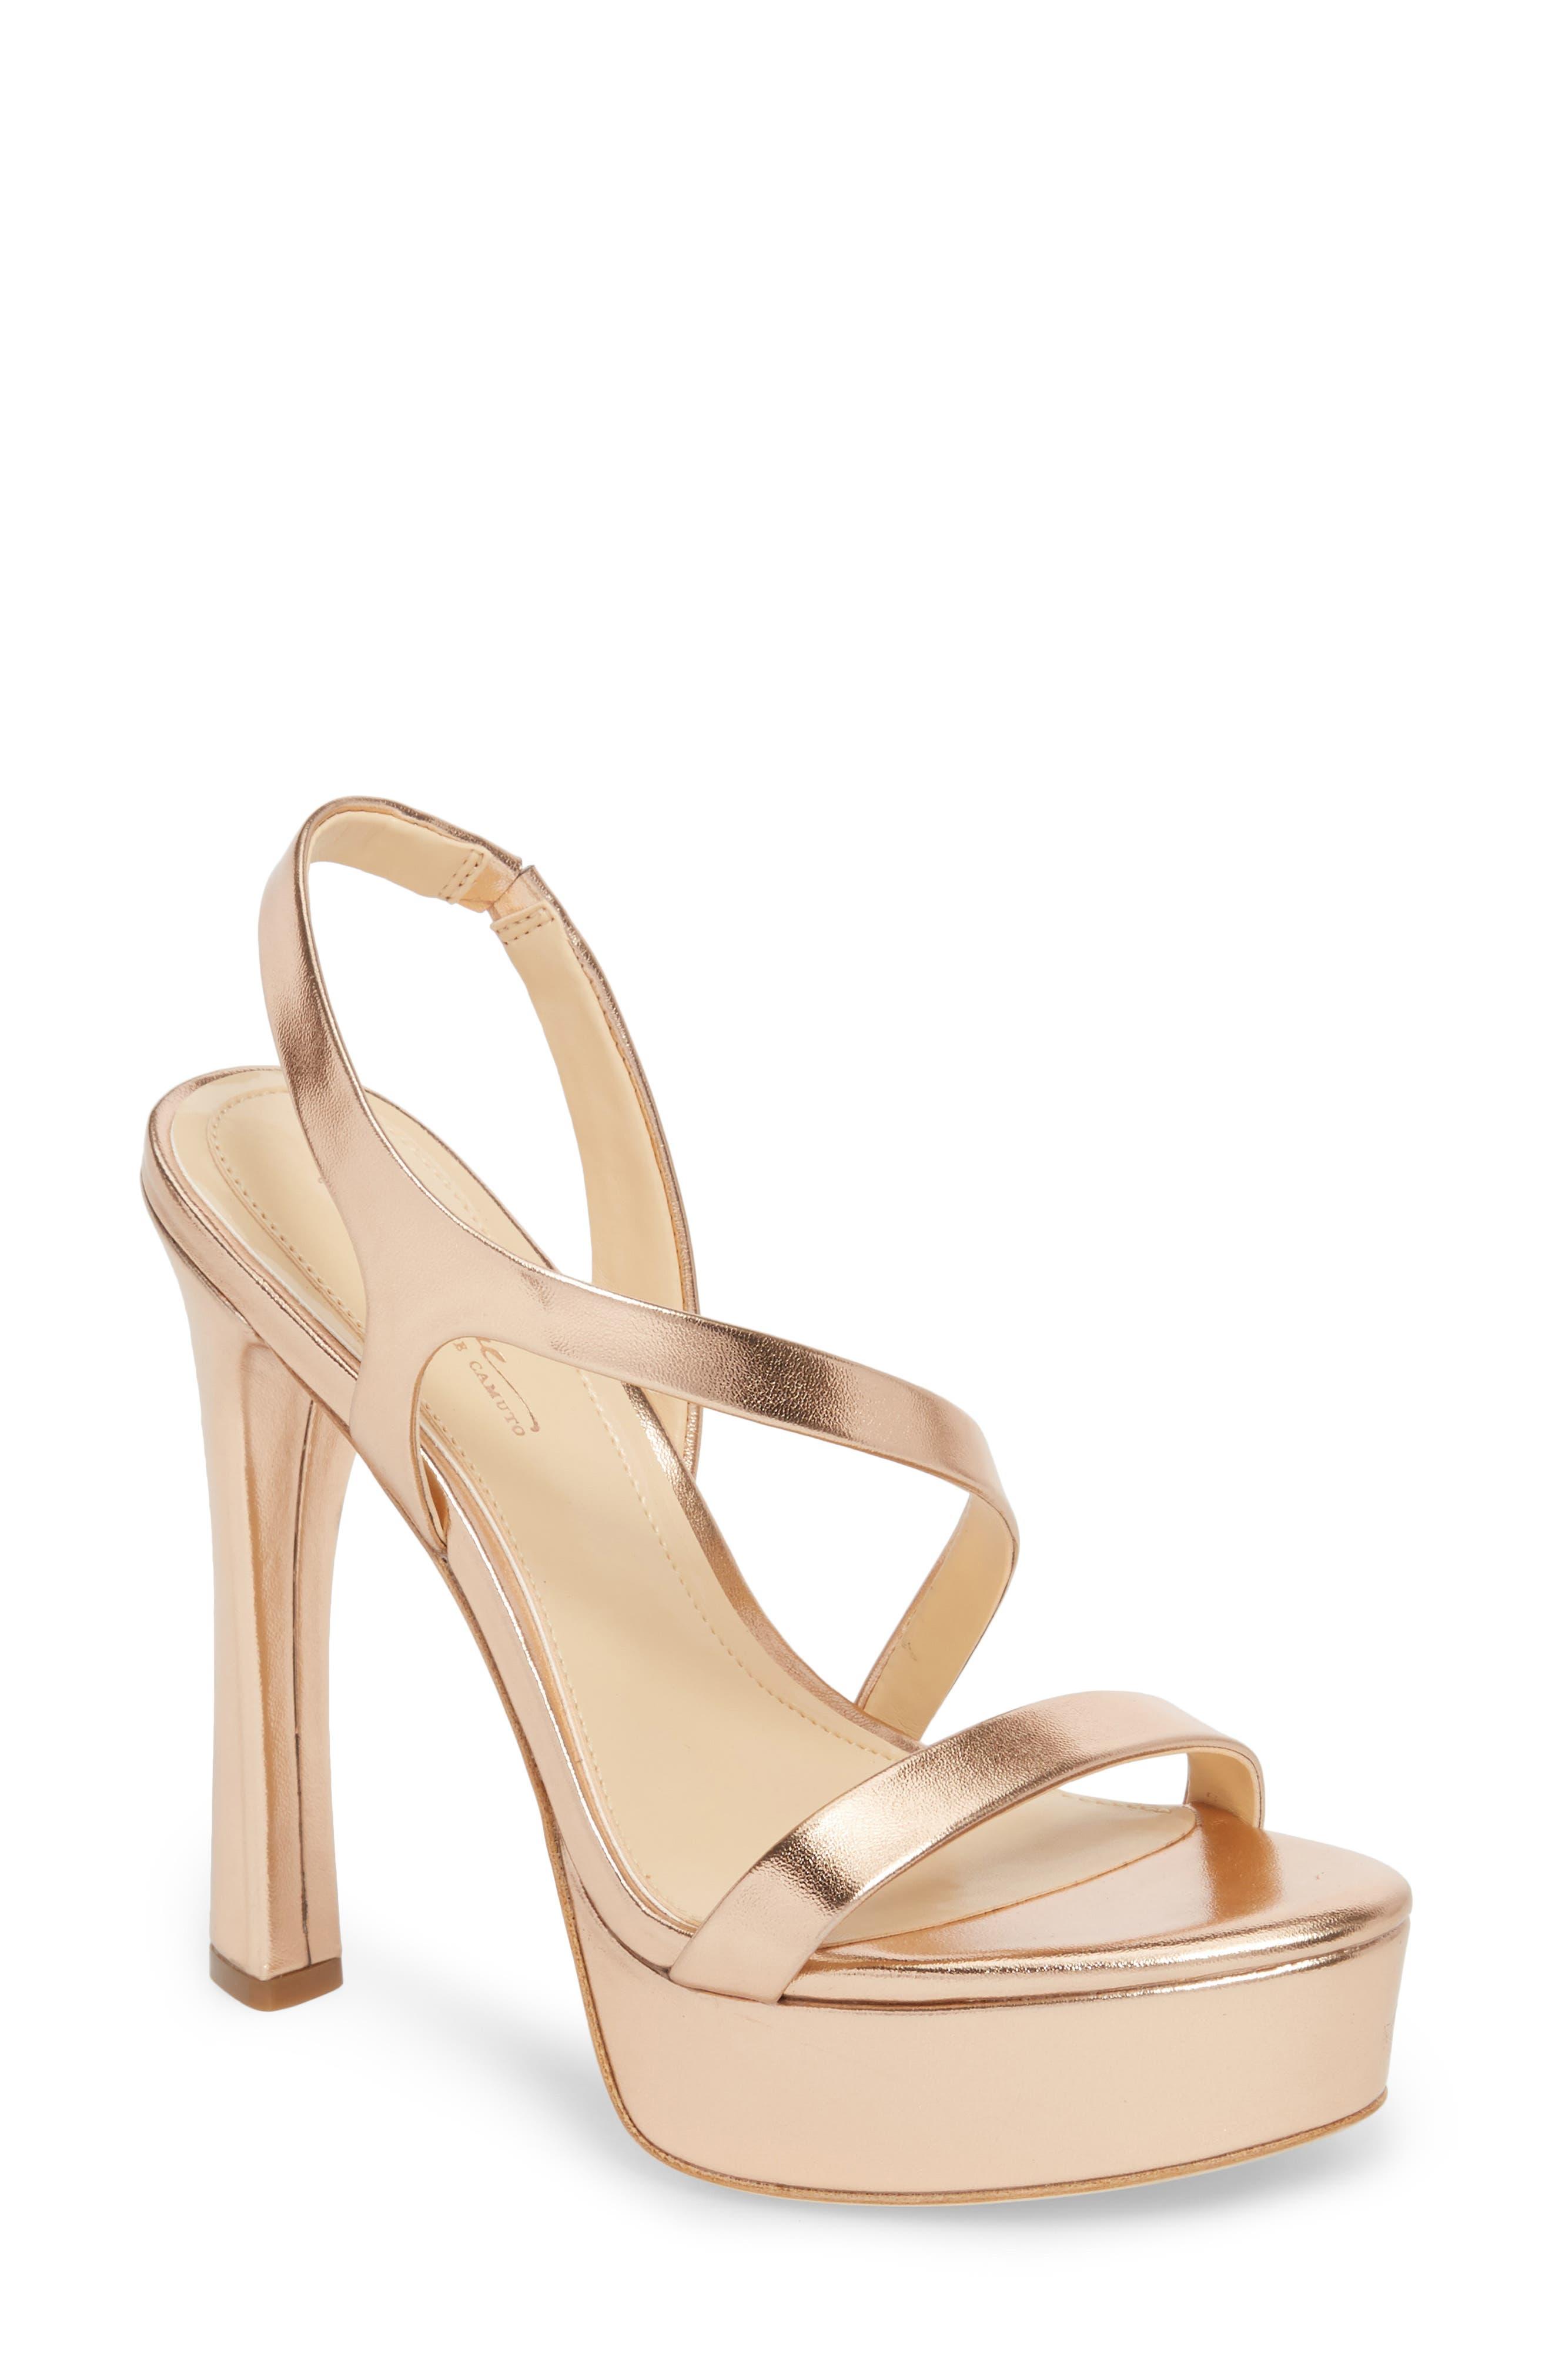 Imagine By Vince Camuto Piera Platform Sandal, Pink